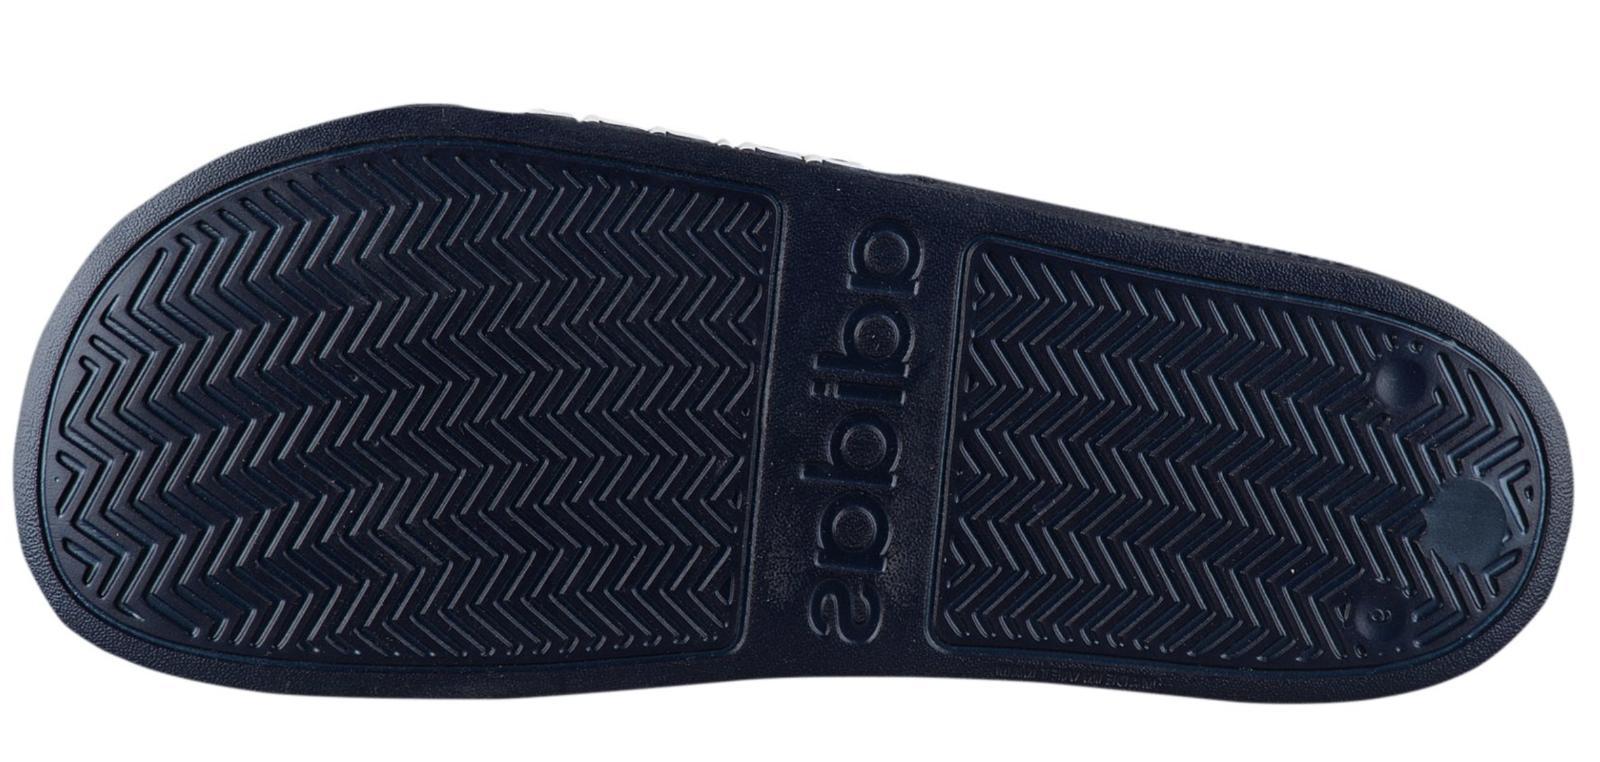 CloudFoam Slides Blue Sport Slippers